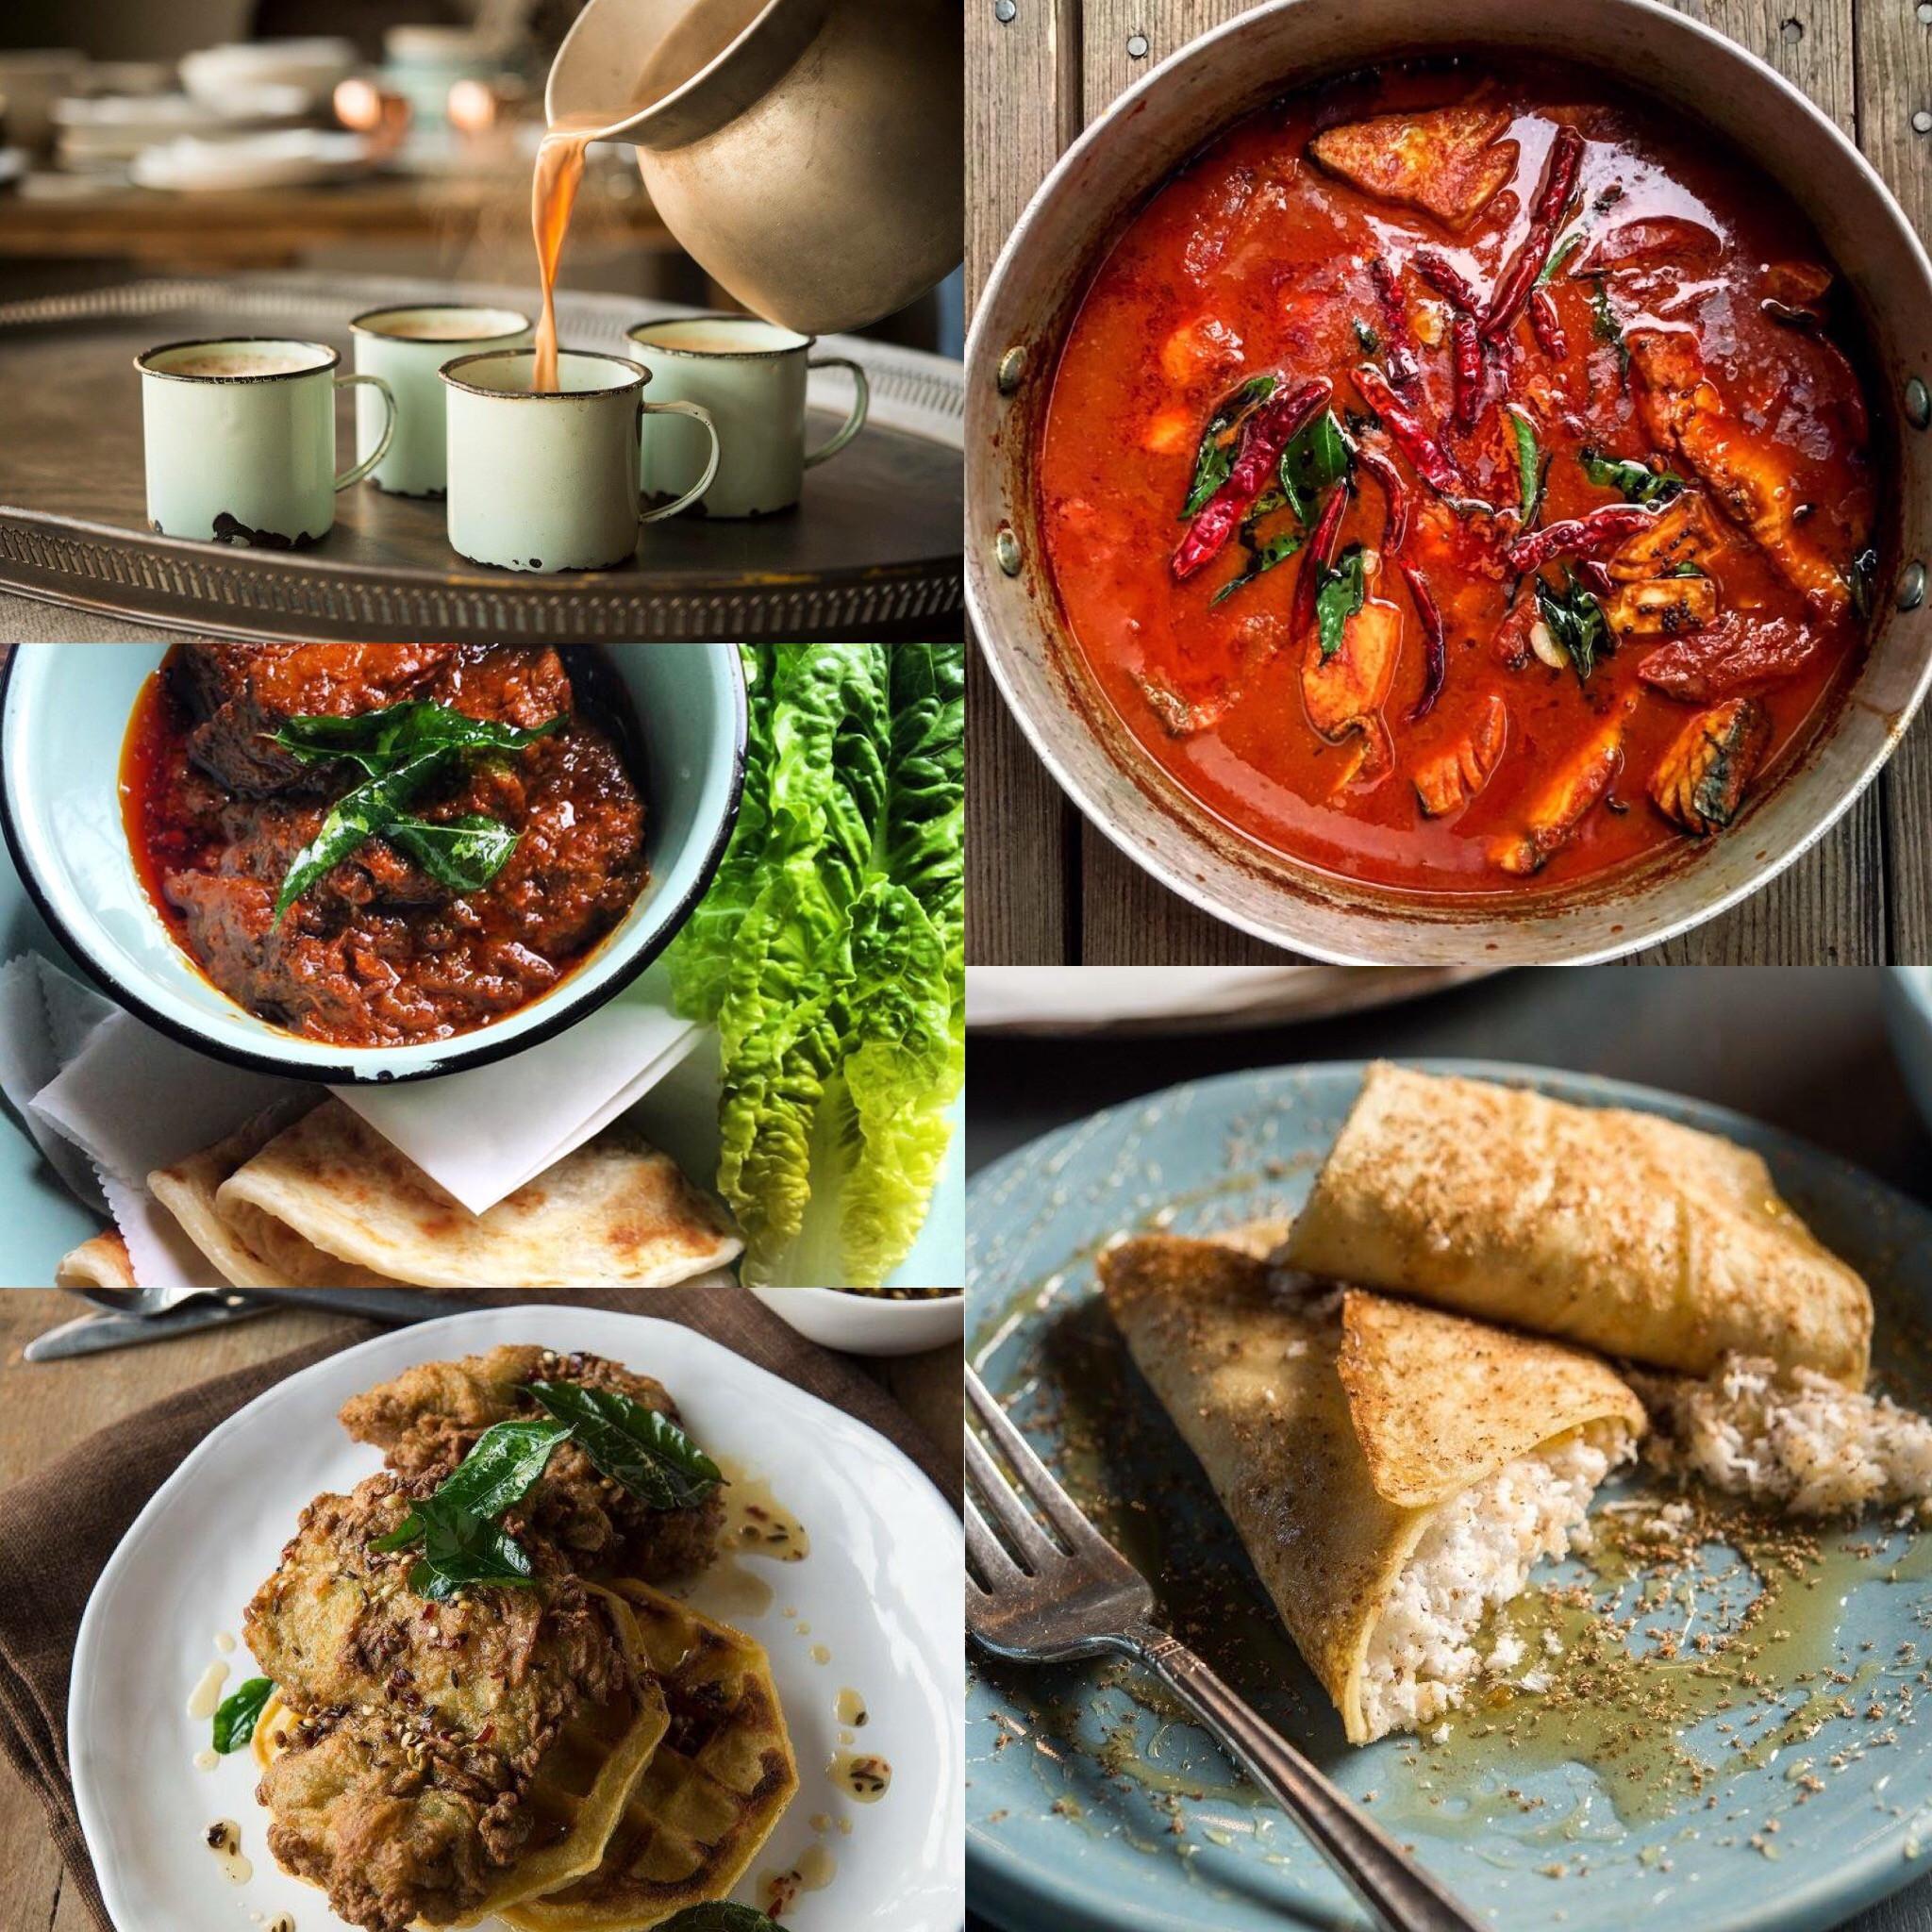 Cardamom Hill's Favorite Feast